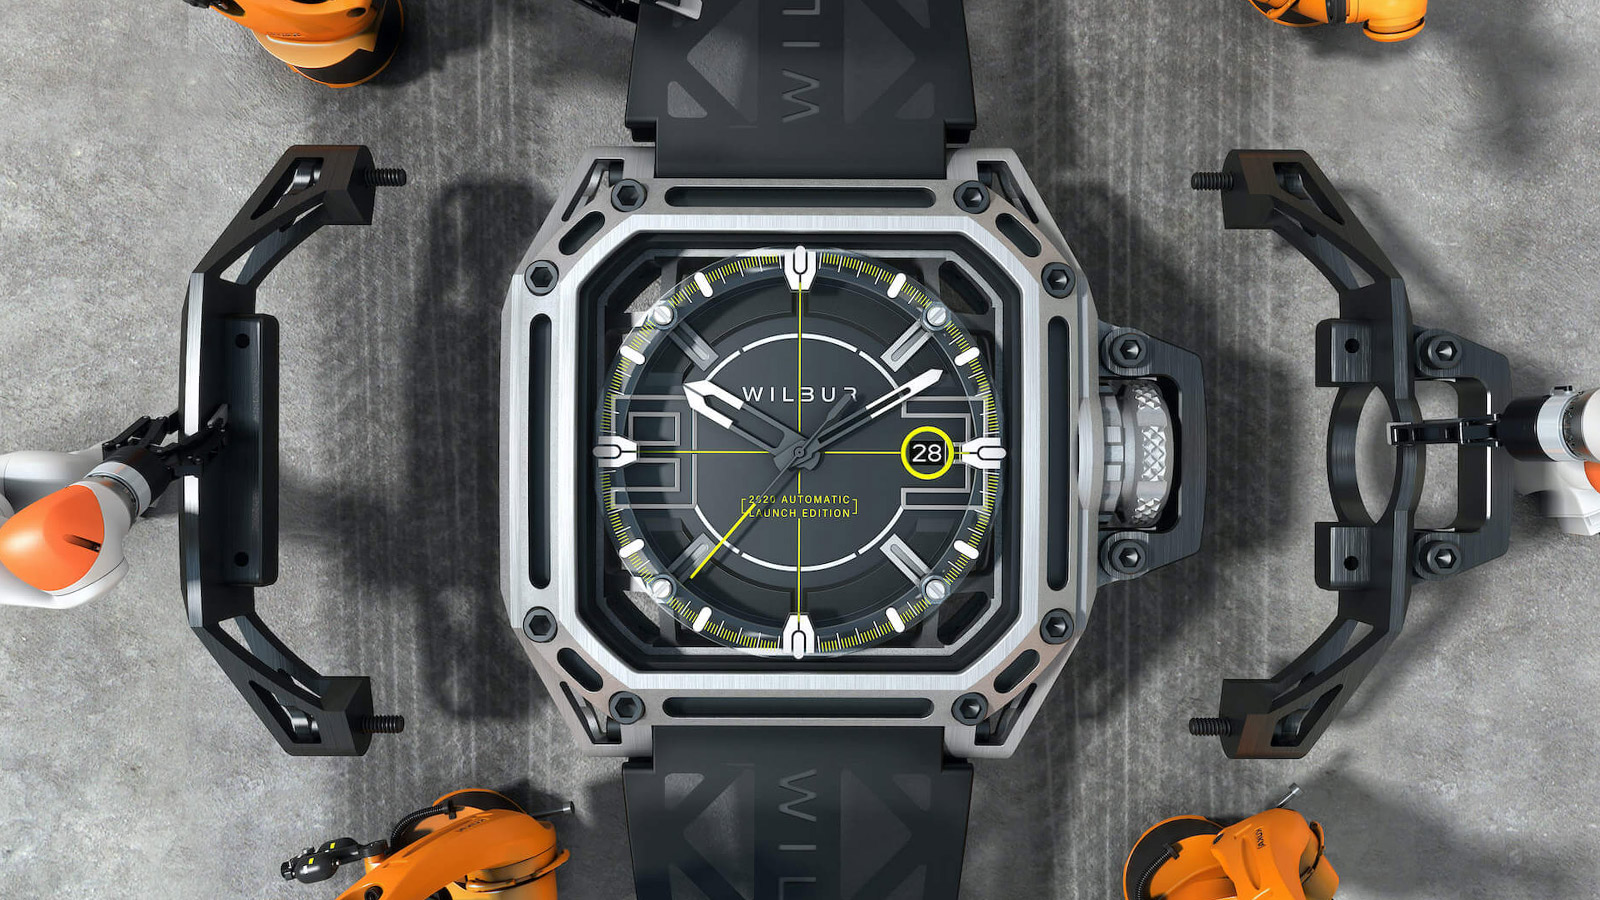 Wilbur 2020 Automatic Launch Edition